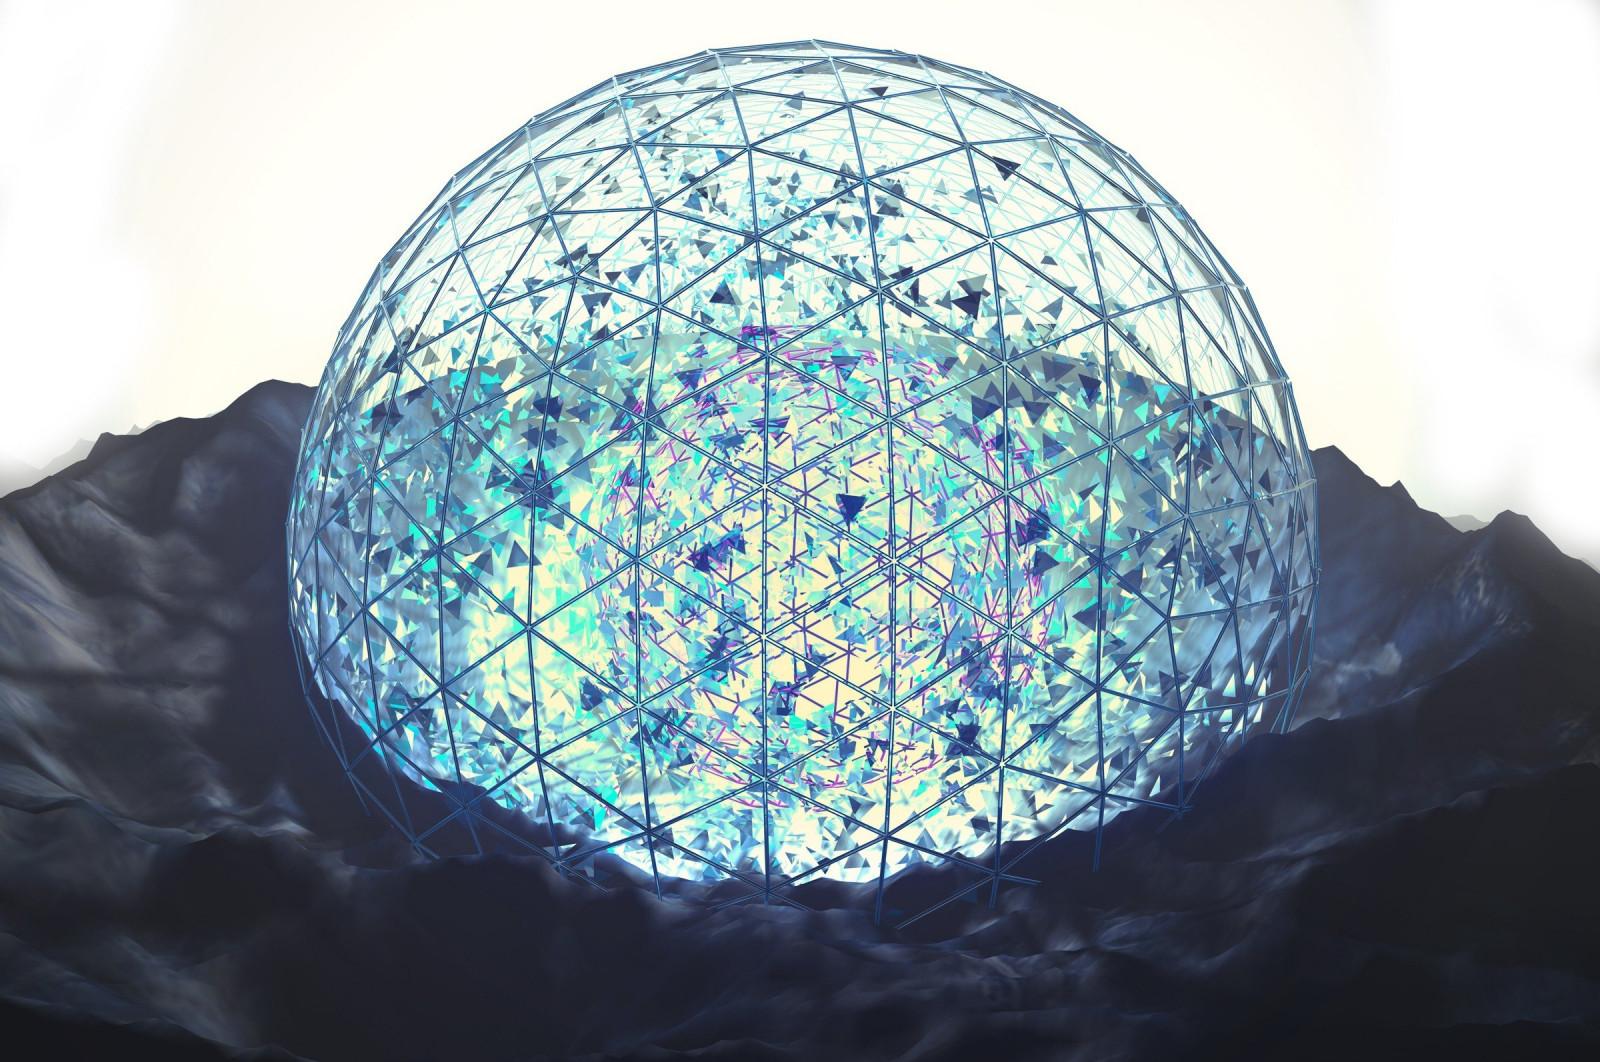 кислоты красивые картинки сферы заметил